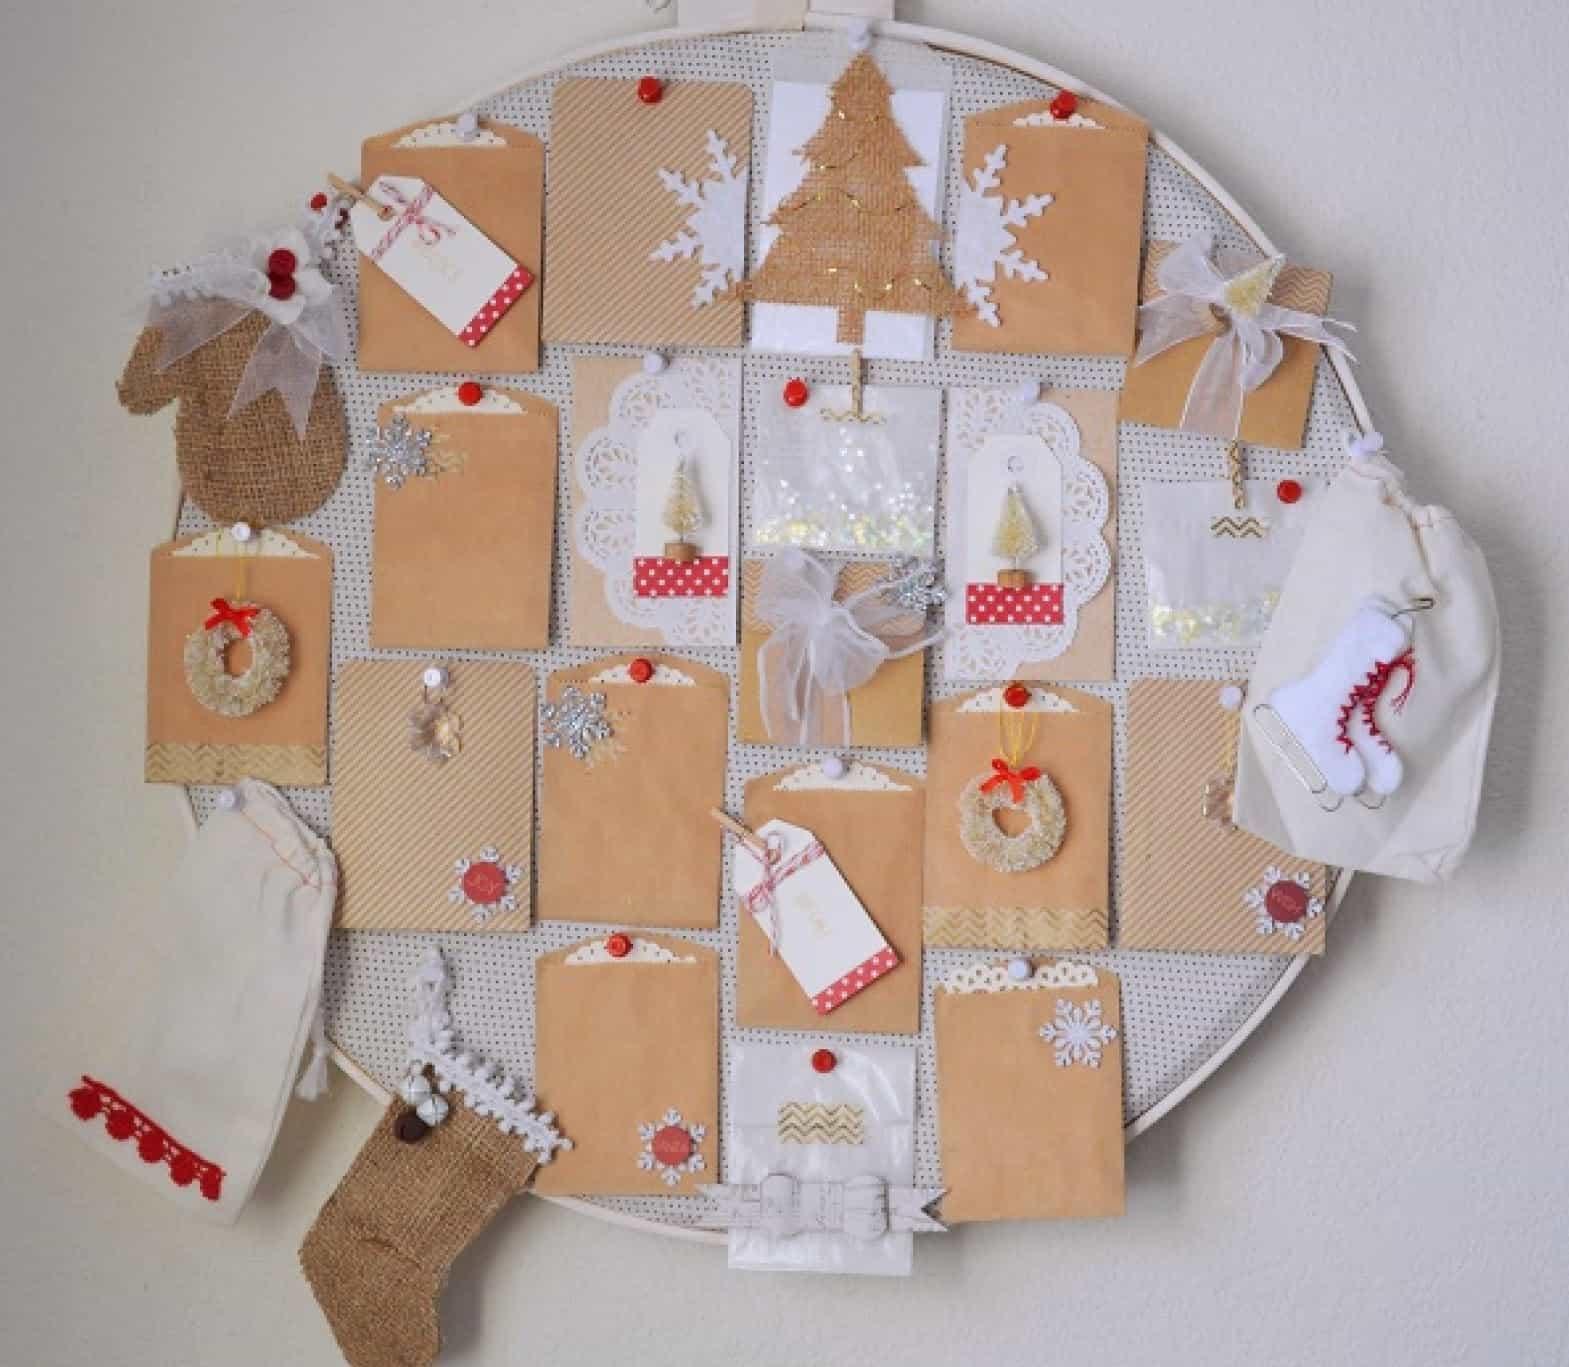 DIY embroidery hoop advent calendar